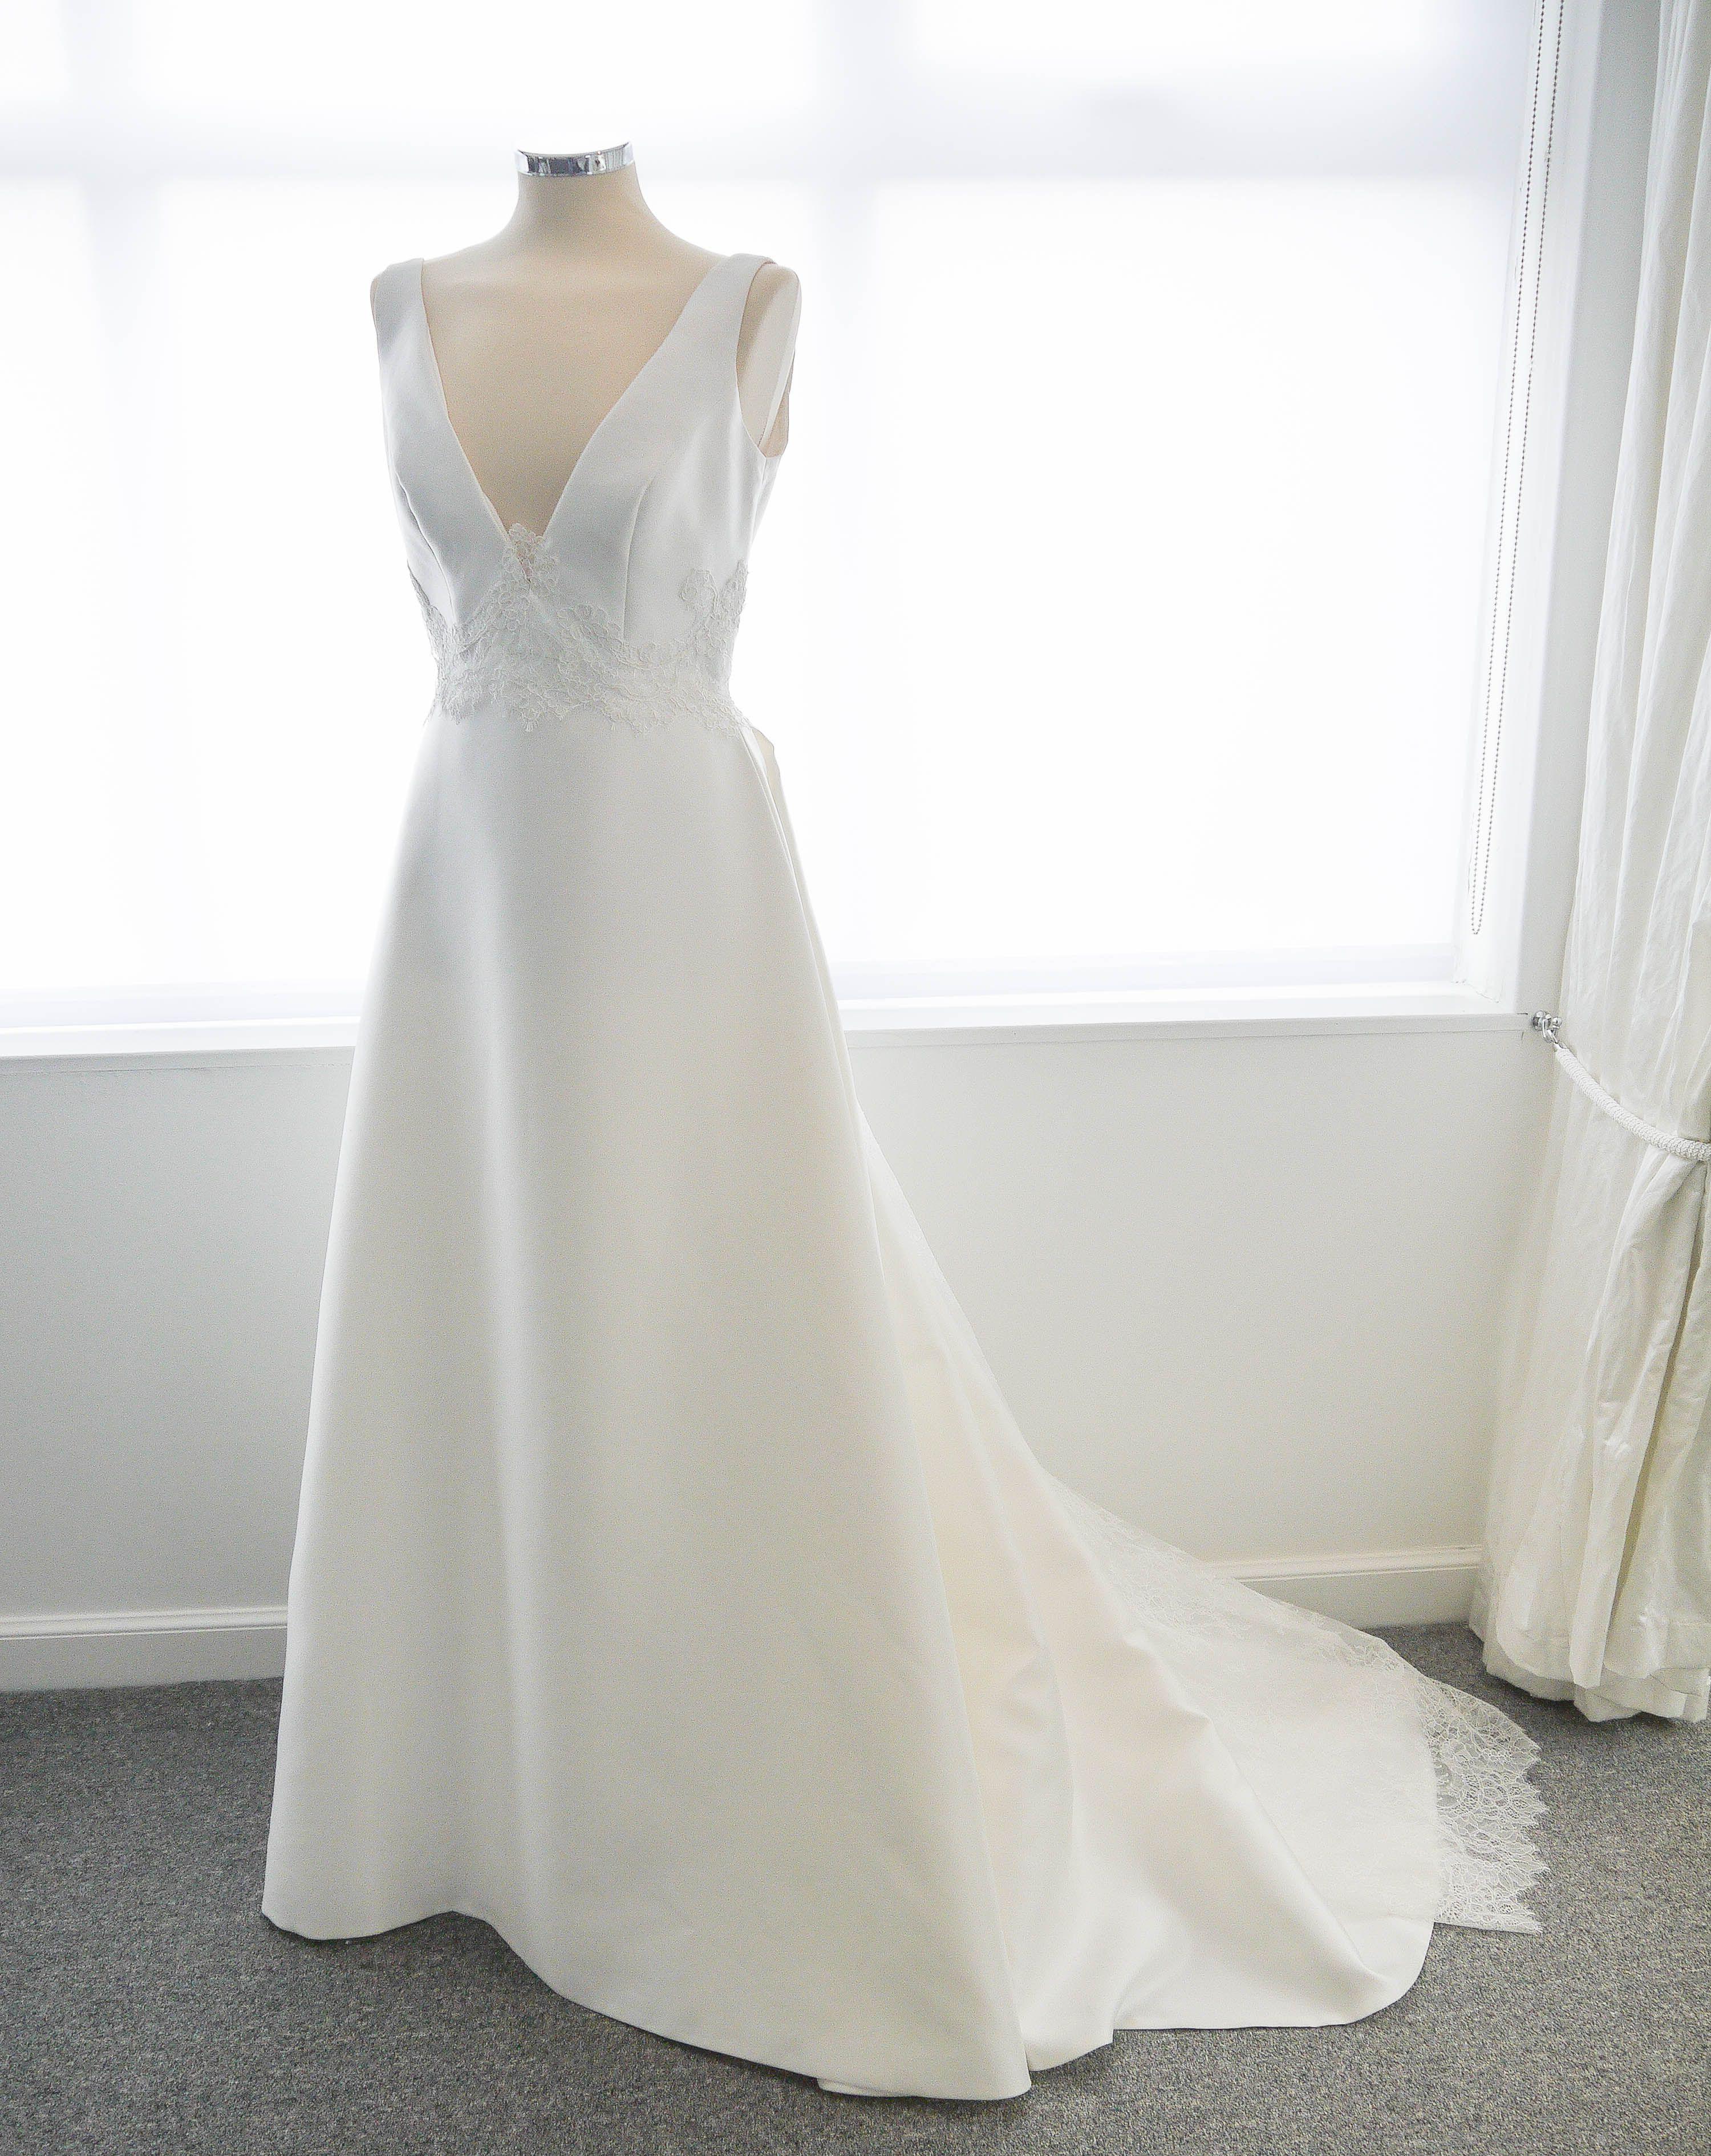 Idesofengland traditional wedding dress deep neckline